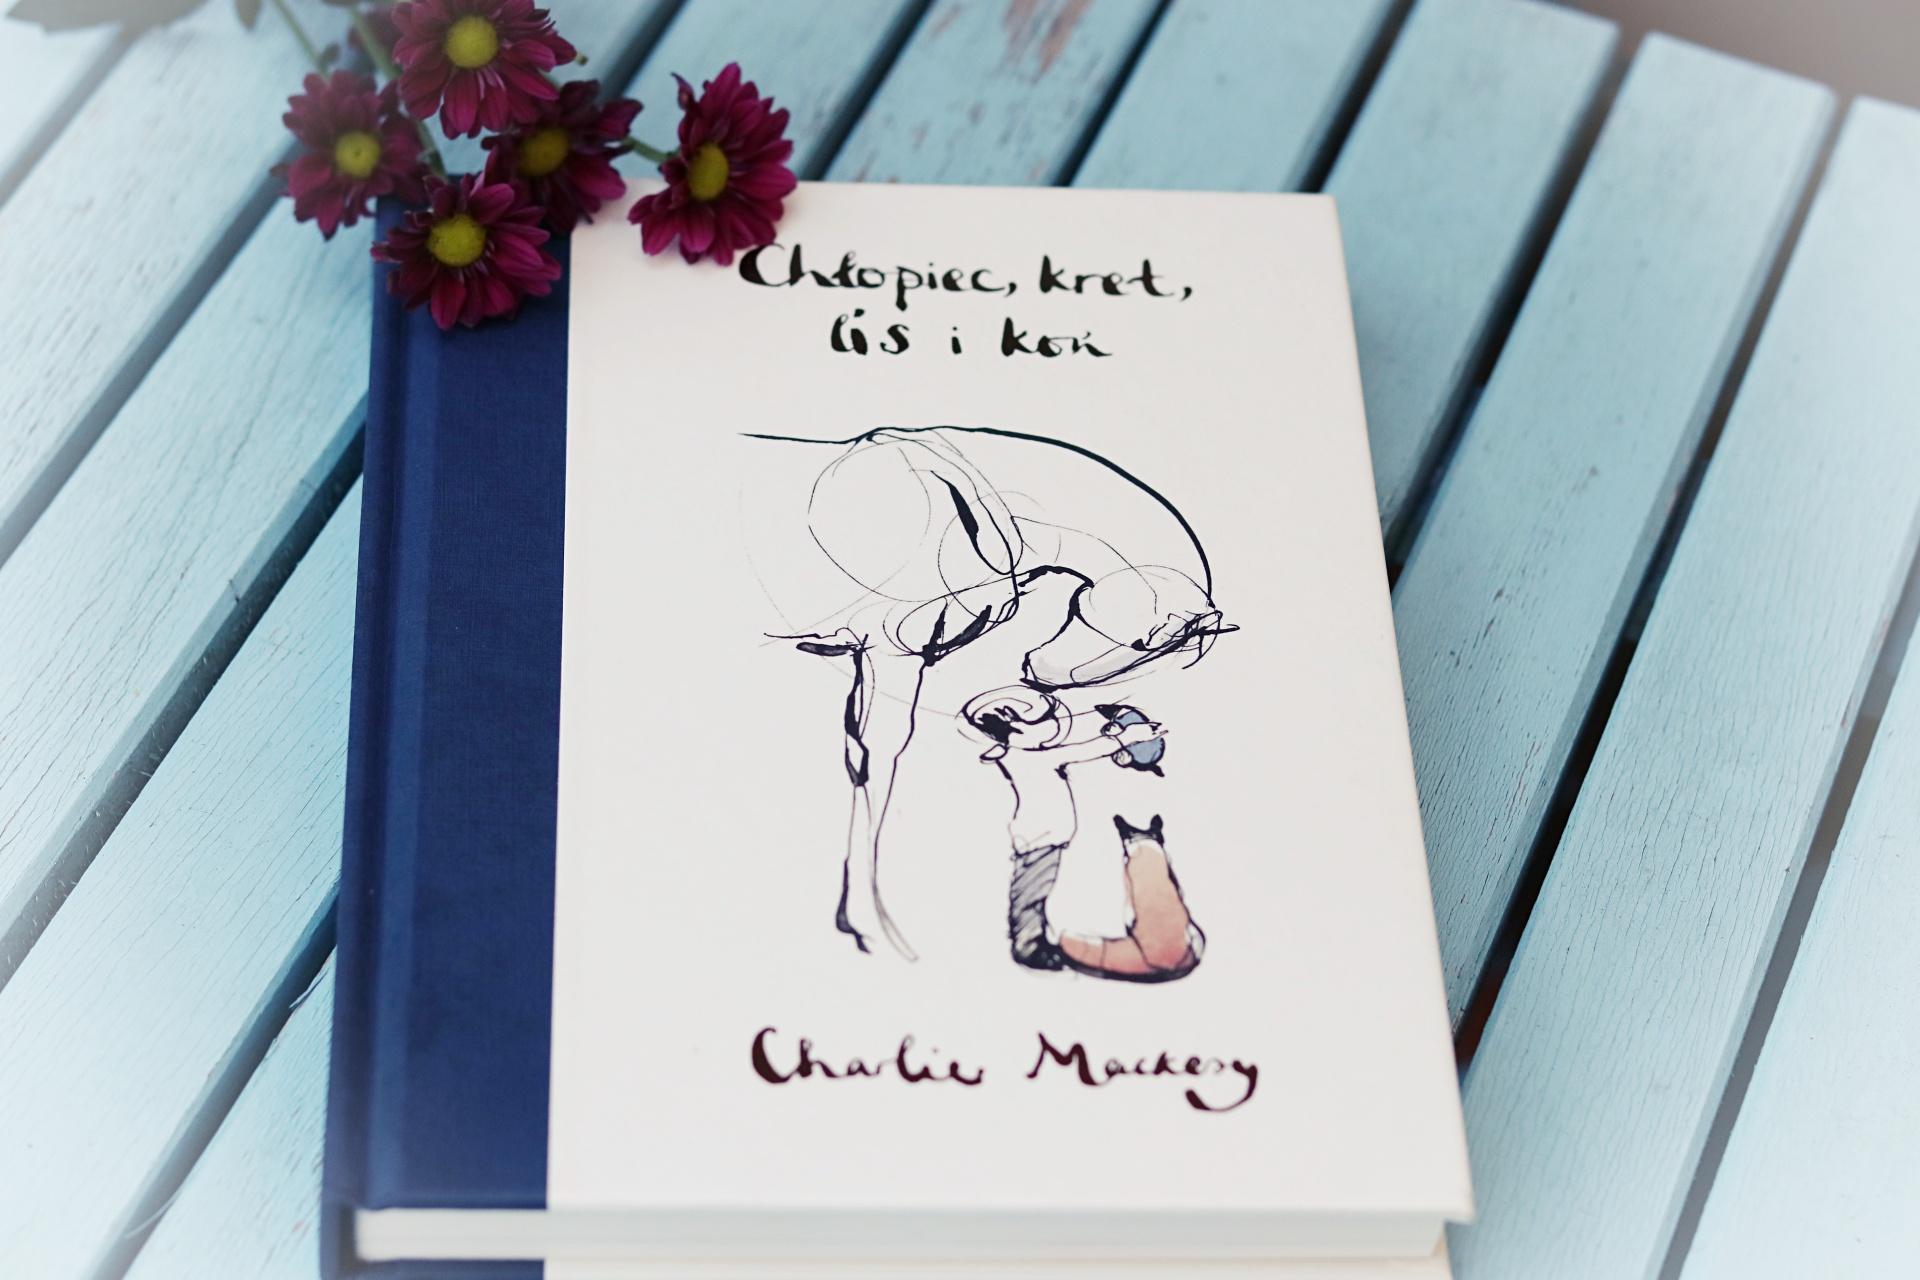 """Chłopiec, kret, lis i koń"" – Charlie Mackesy"